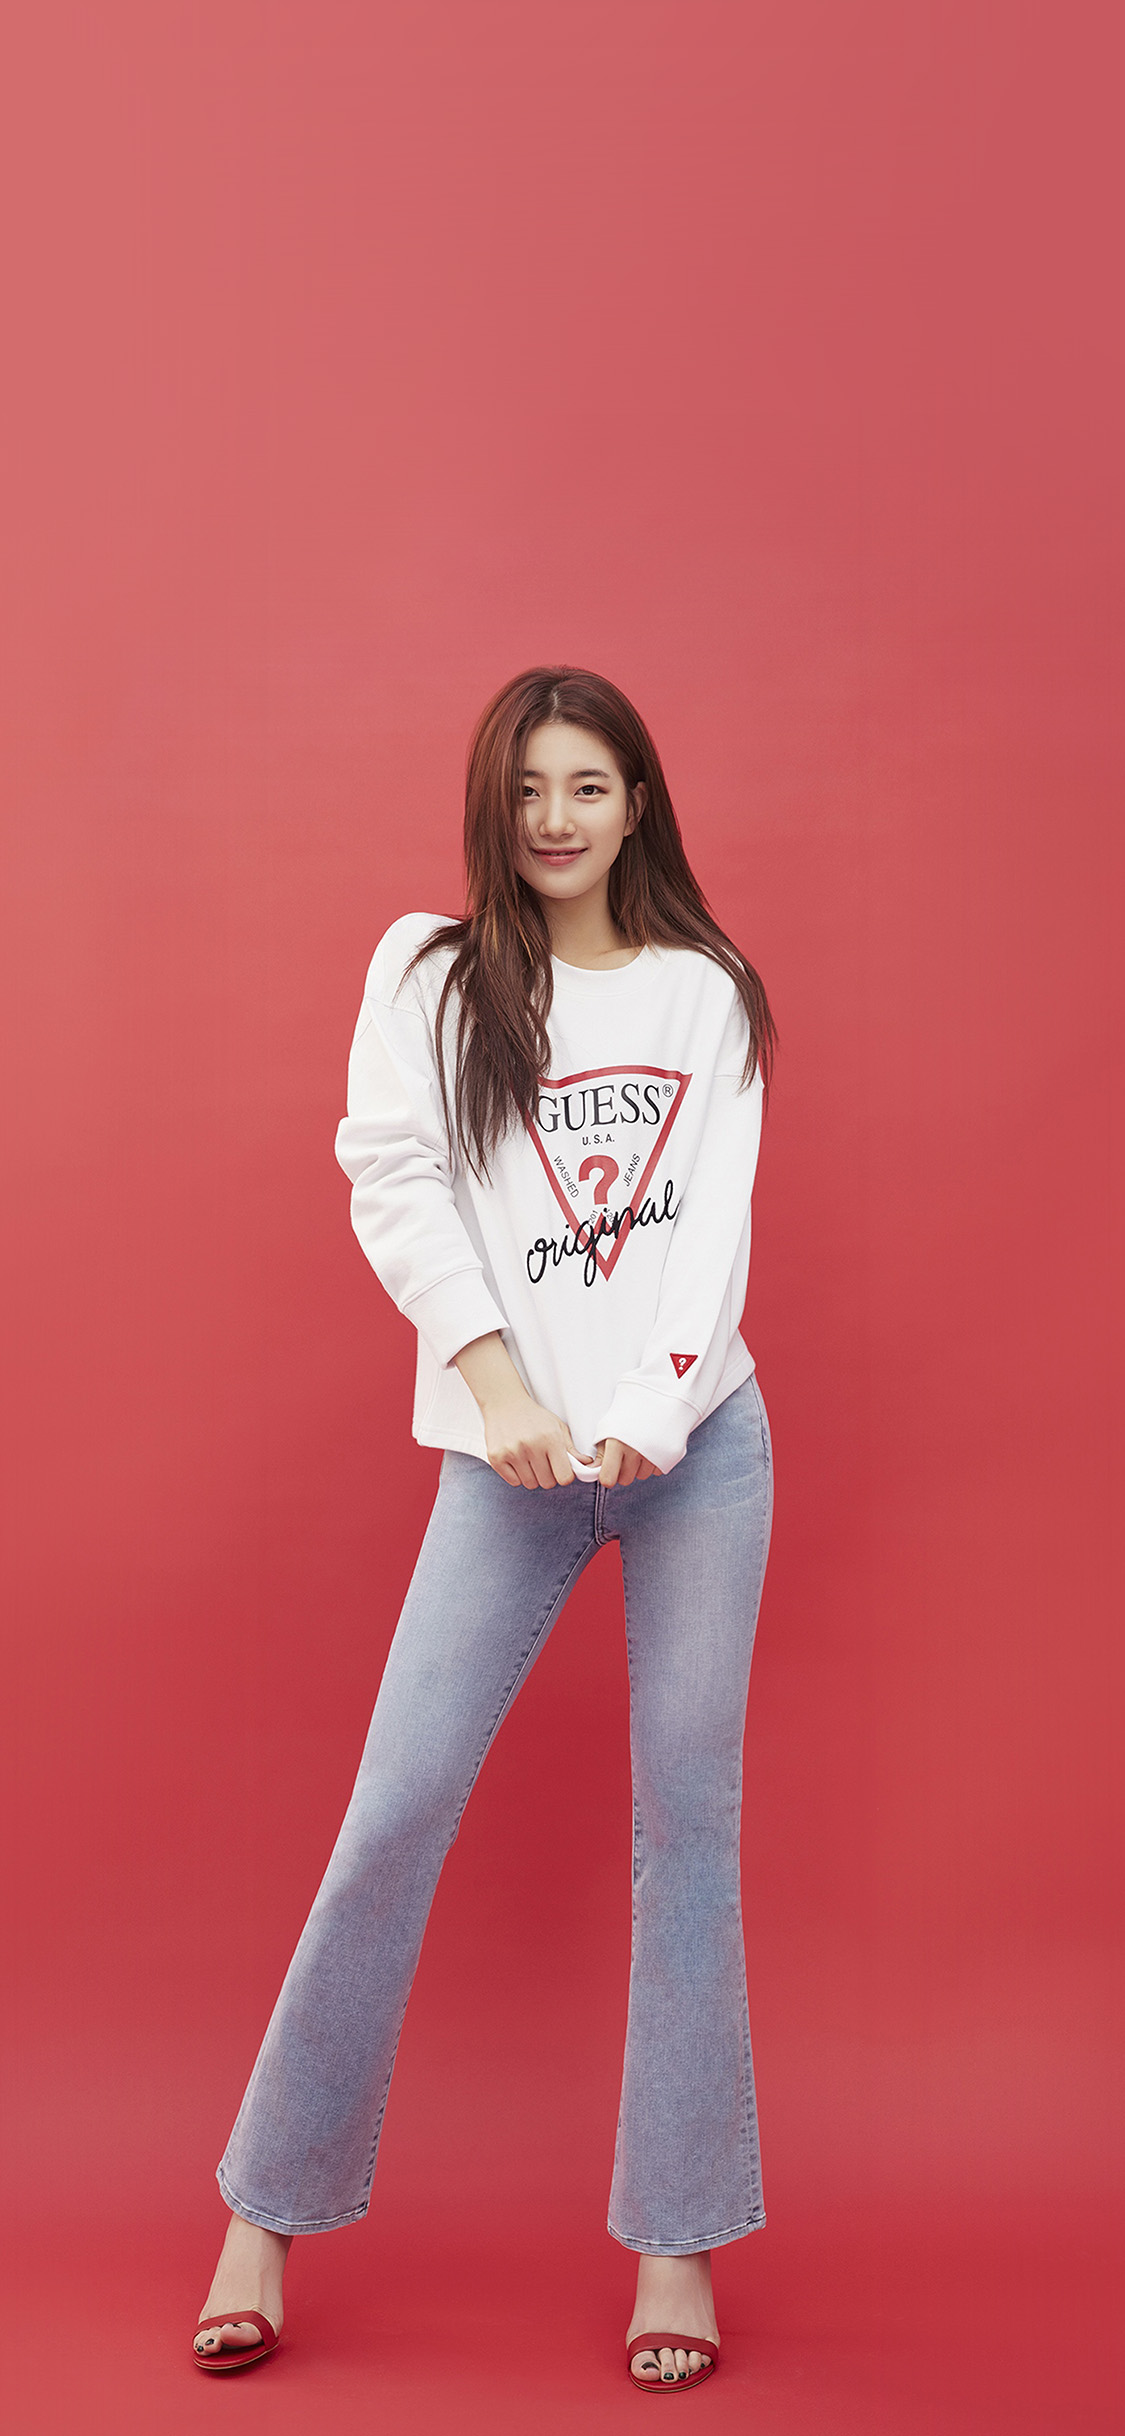 hr70-suji-girl-kpop-red-guess-wallpaper